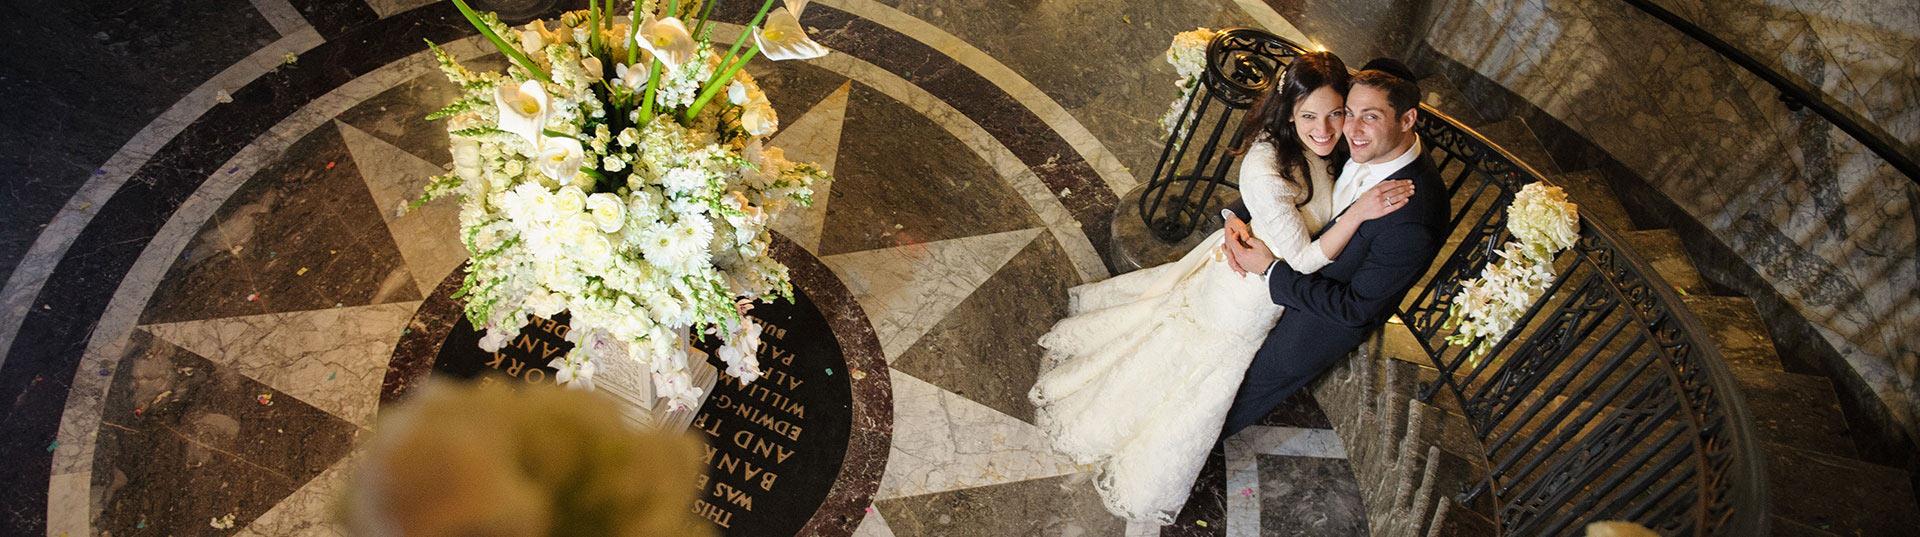 Weddings at 48 Wall Street